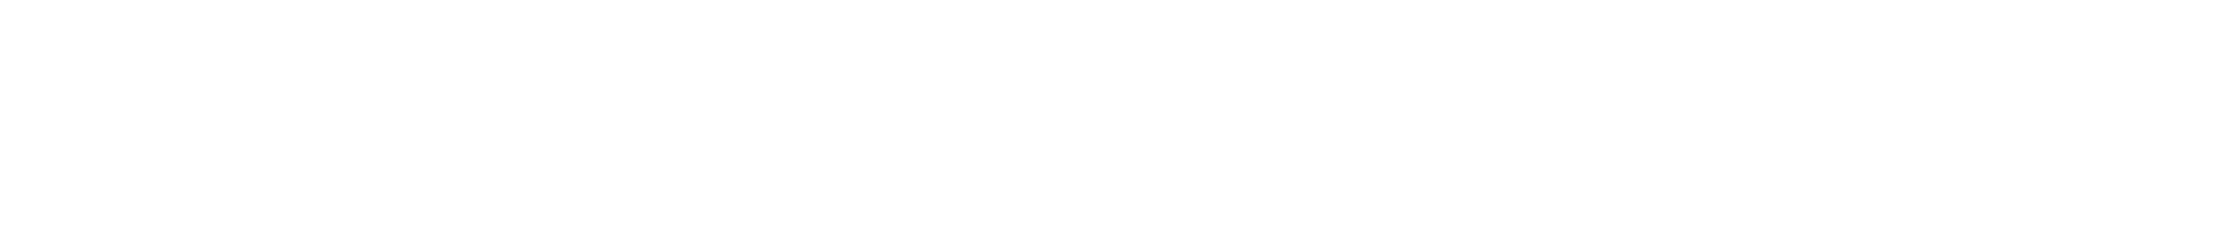 CellesriaArt.com